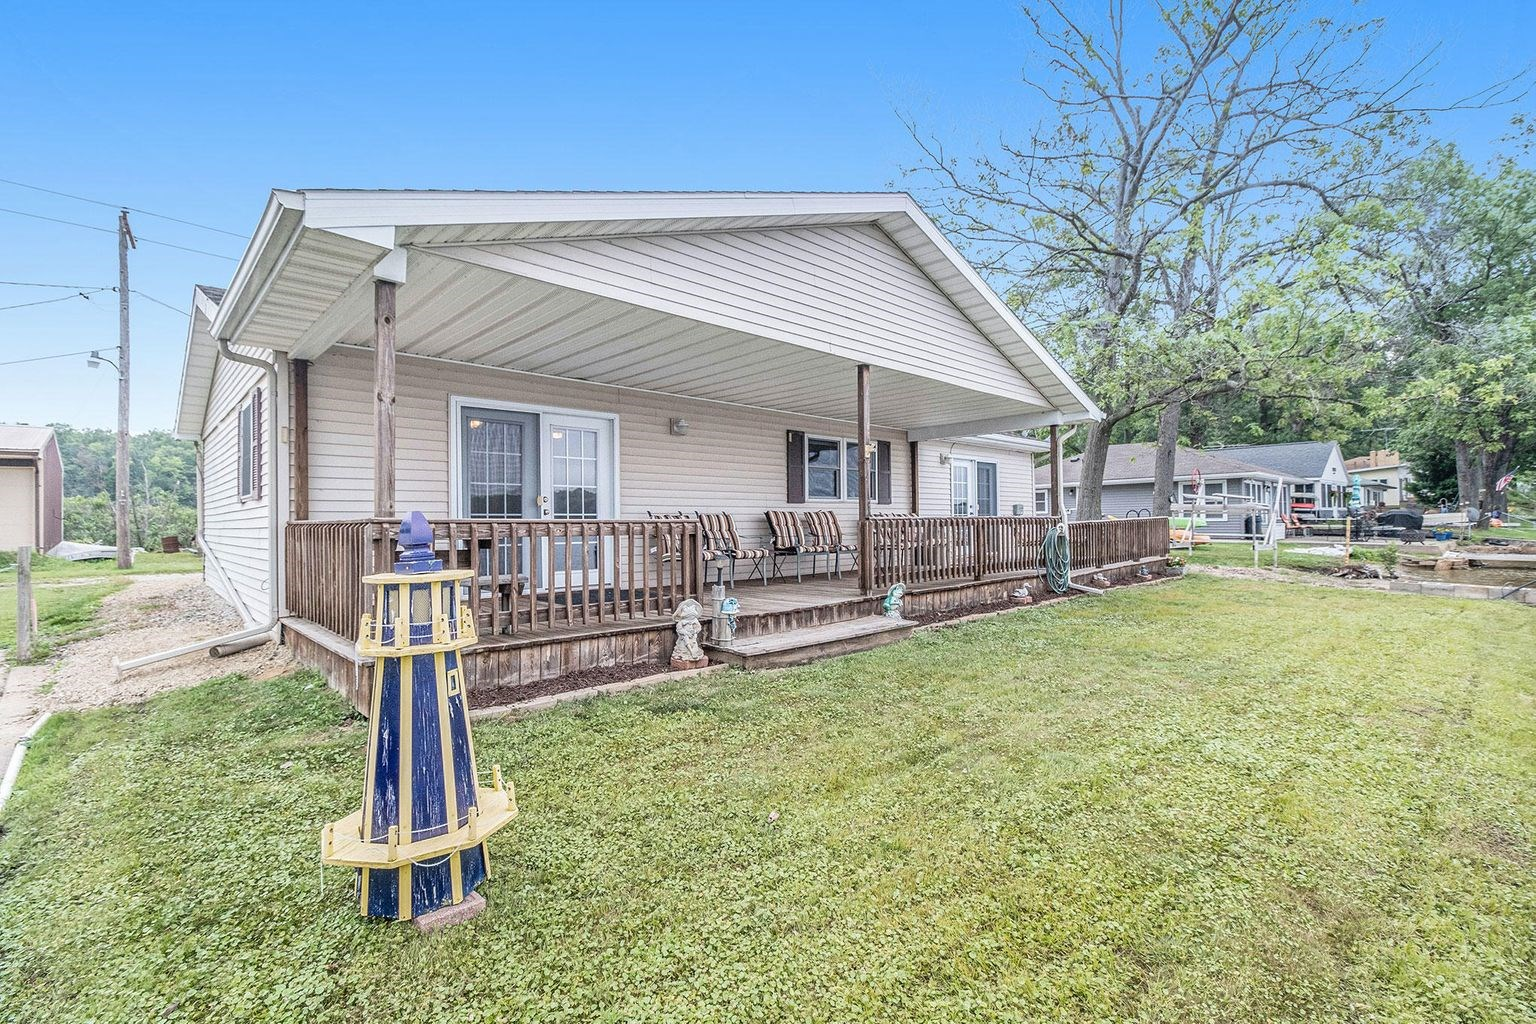 Lakefront Home For Sale in Delton, Michigan!